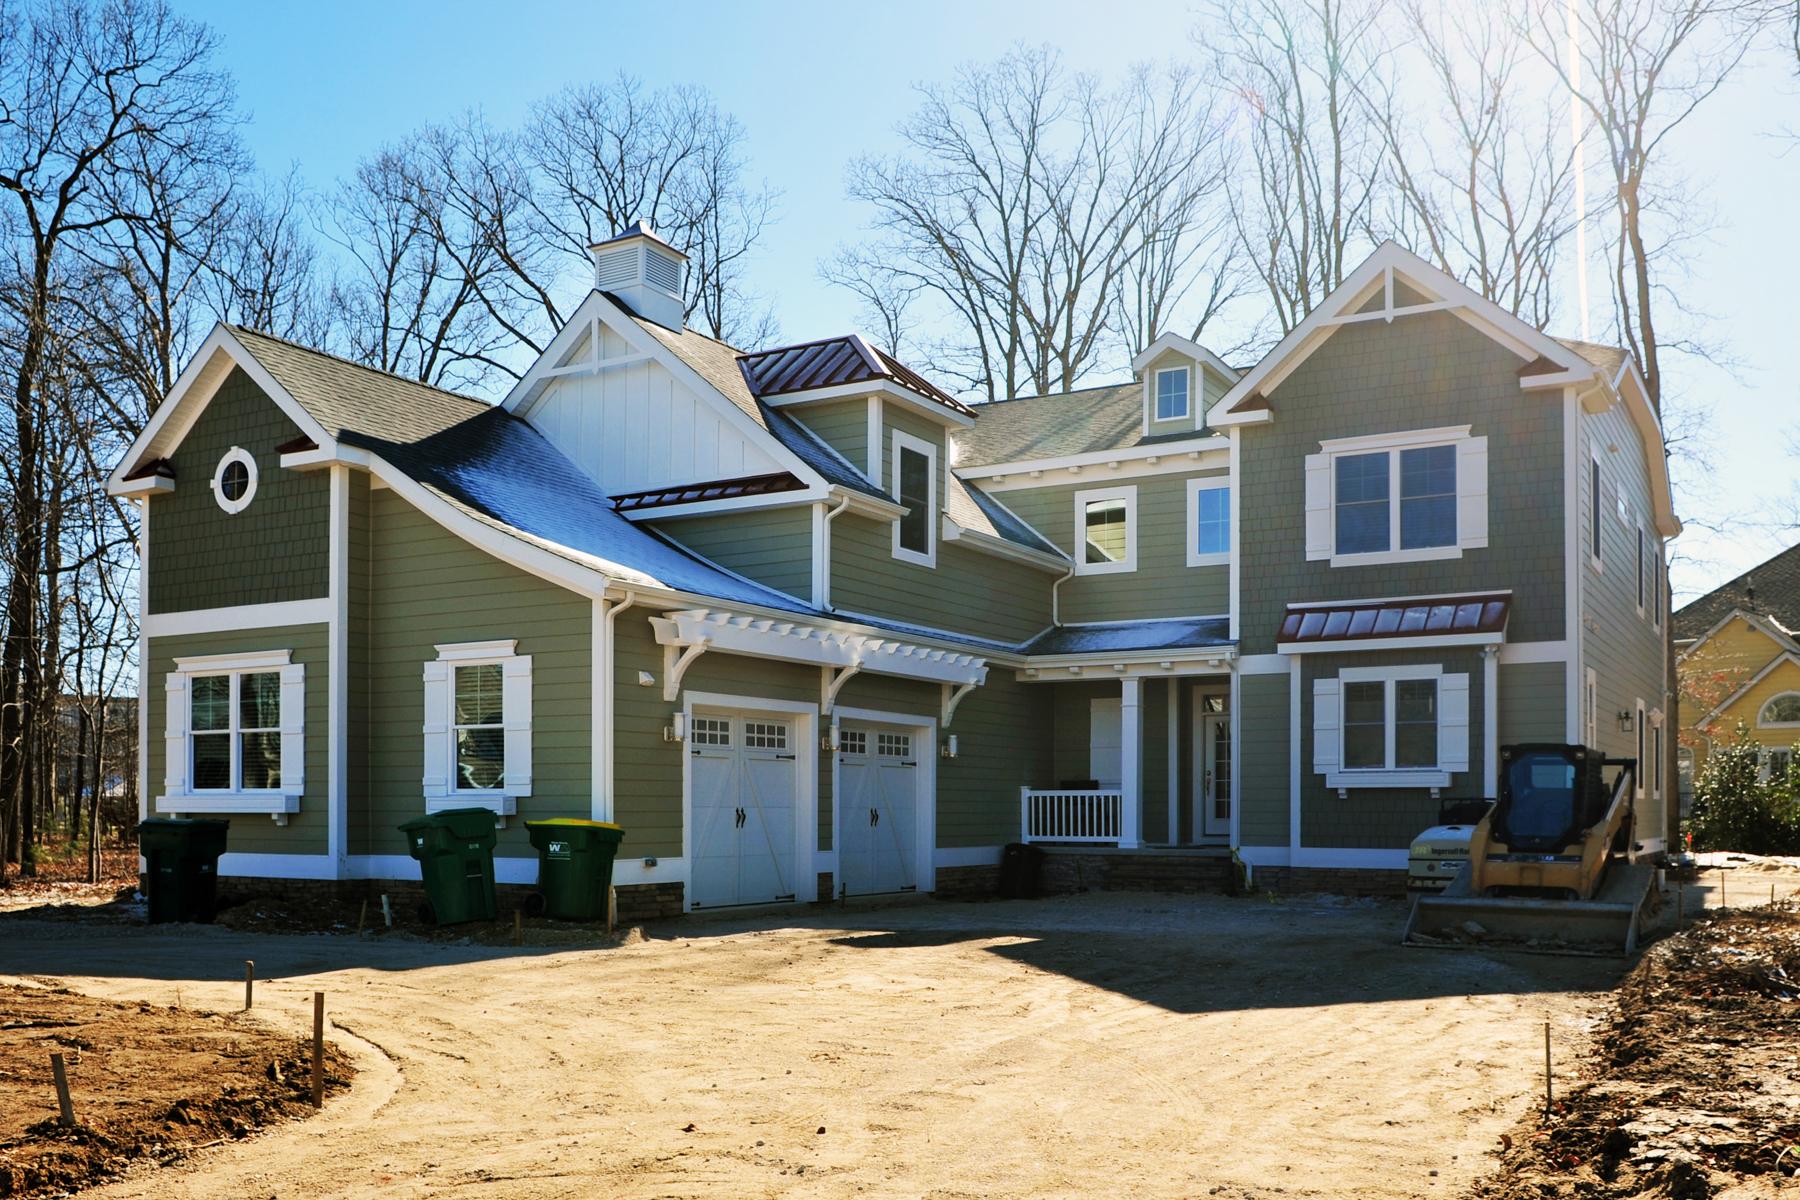 Additional photo for property listing at 33196 Mariners Ave, Millsboro, DE 19966 33196  Mariners Ave (bethany Sfh), Millsboro, Delaware 19966 Estados Unidos